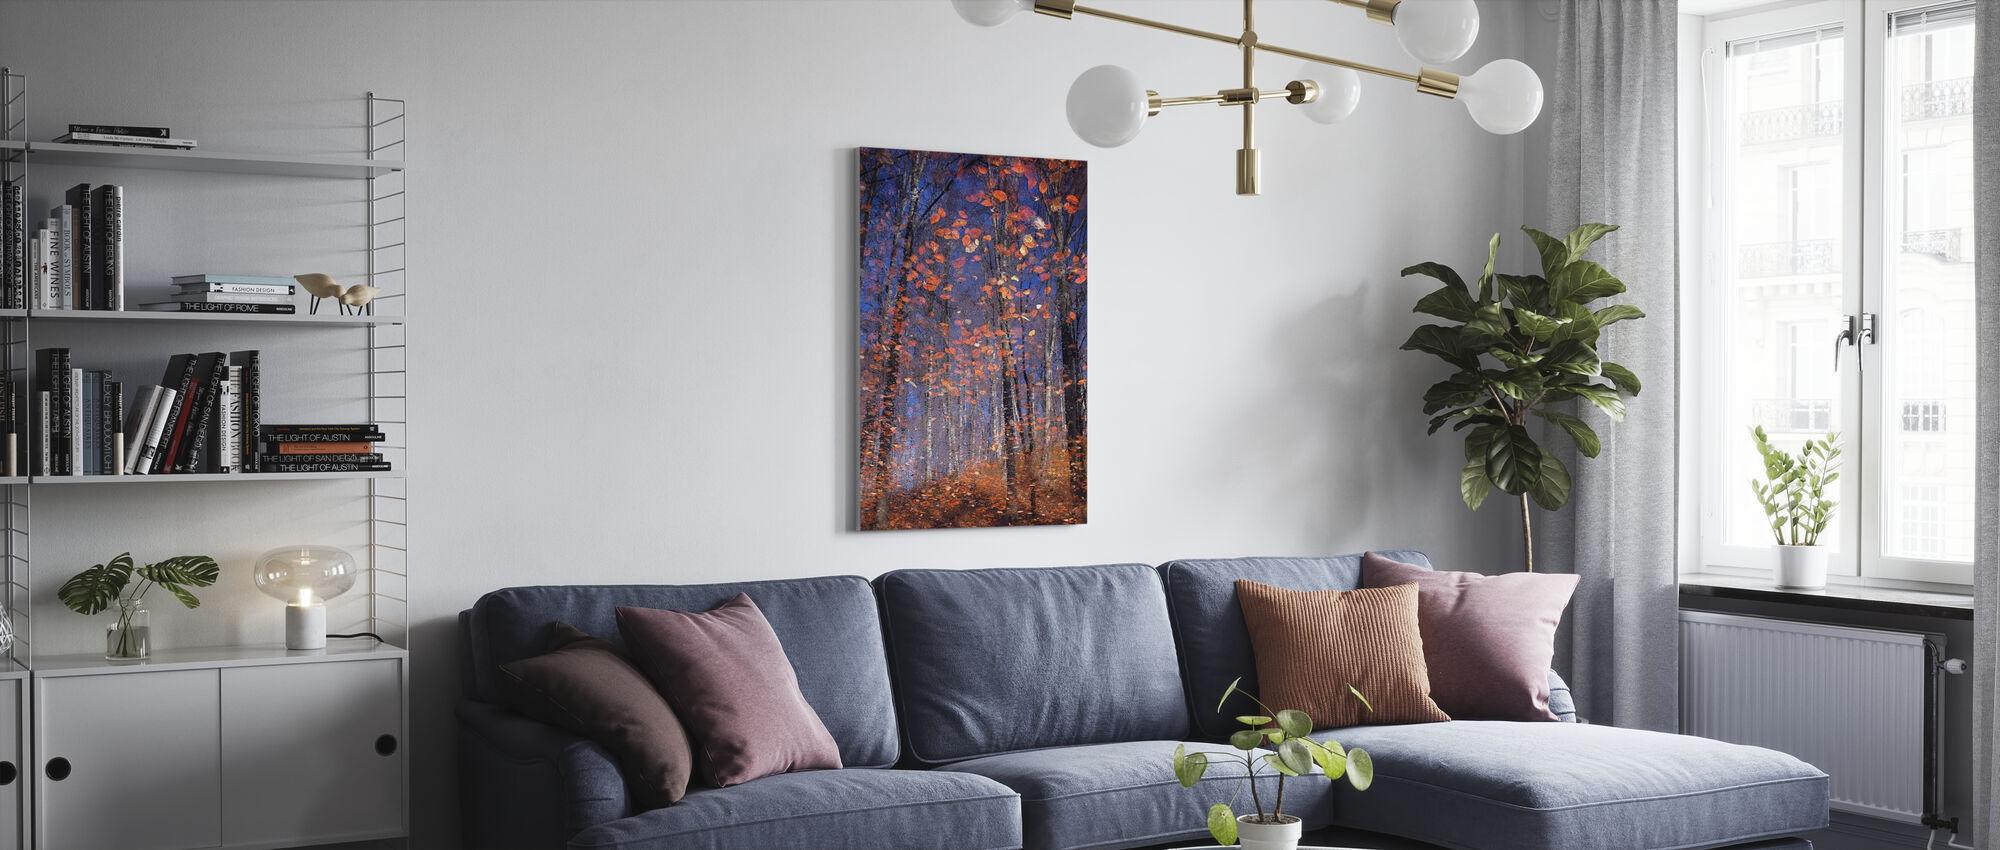 Golden Autumn Leaves - Canvas print - Living Room